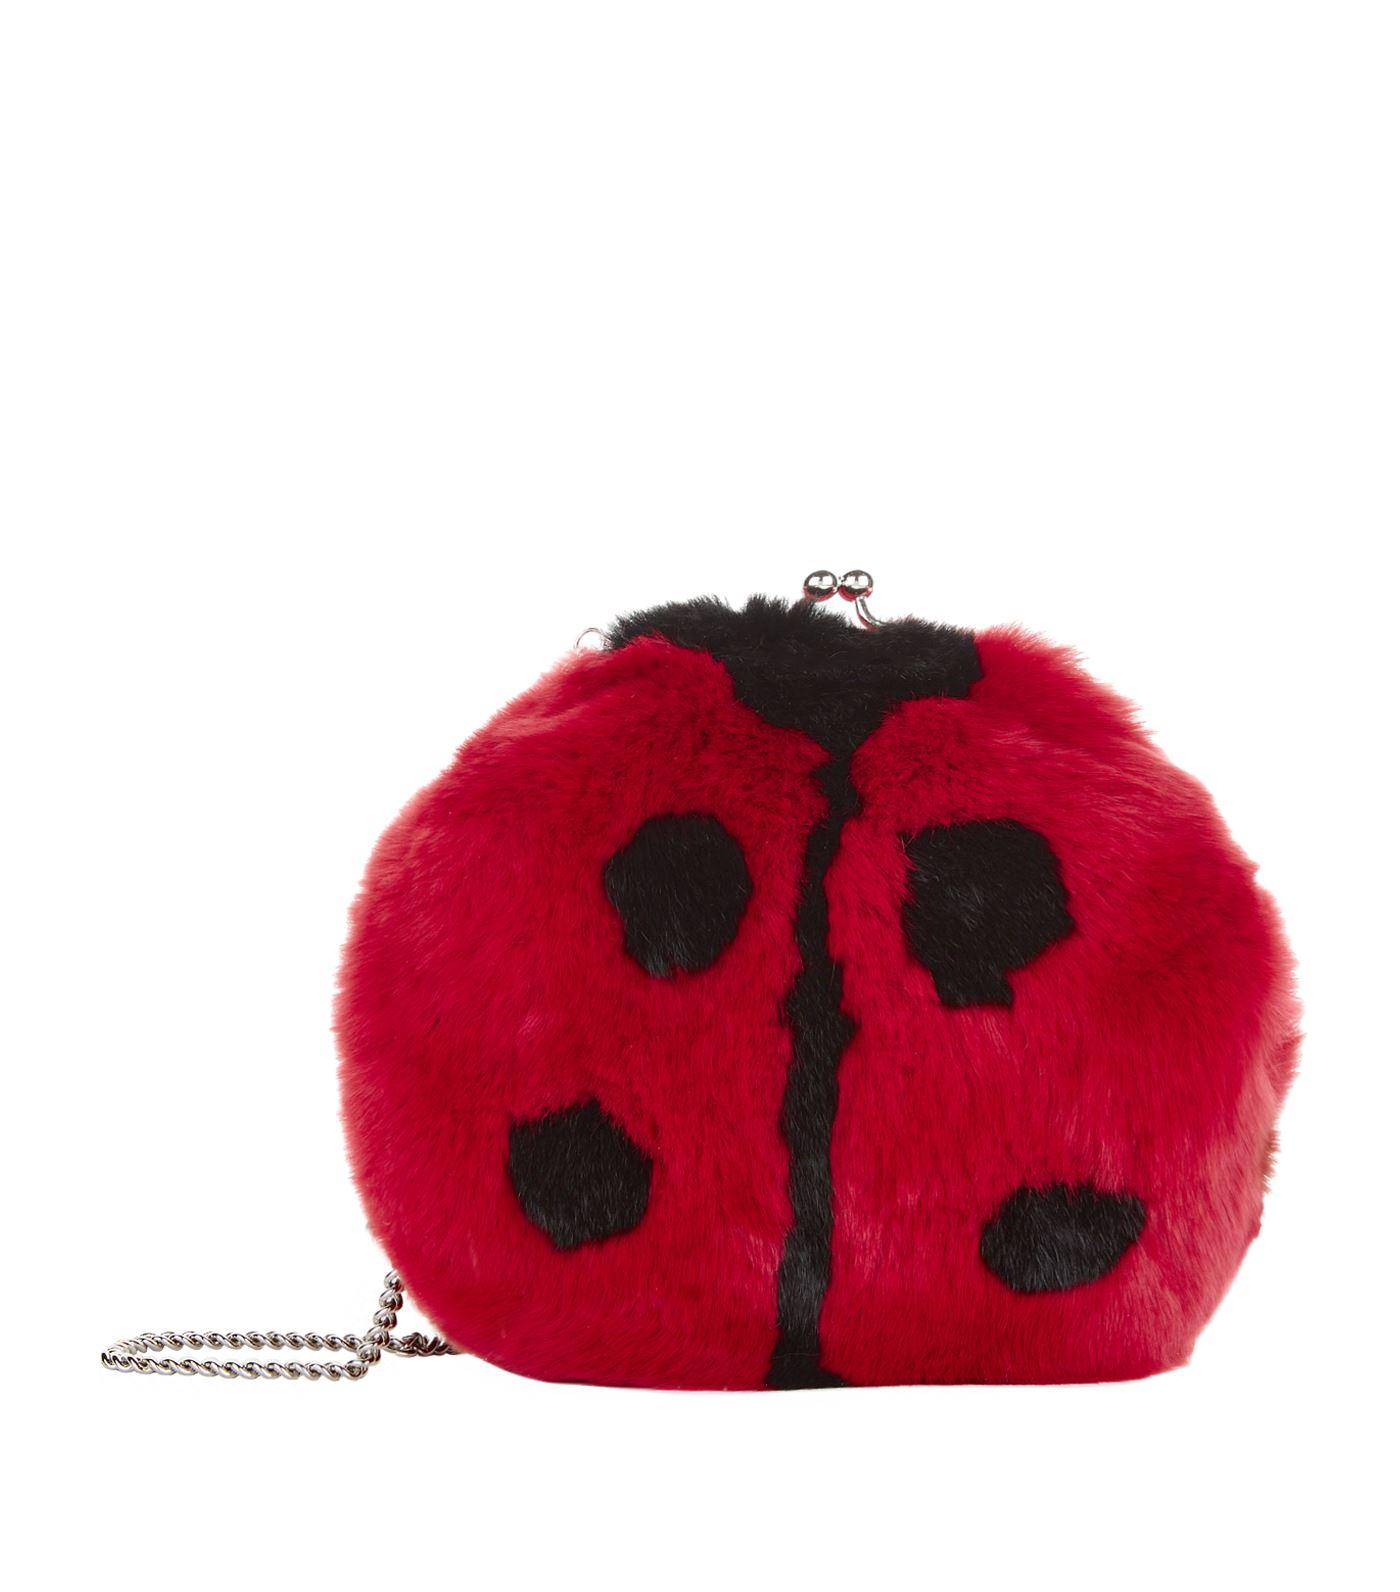 Dolce & Gabbana Ladybird Shoulder Bag In Multi